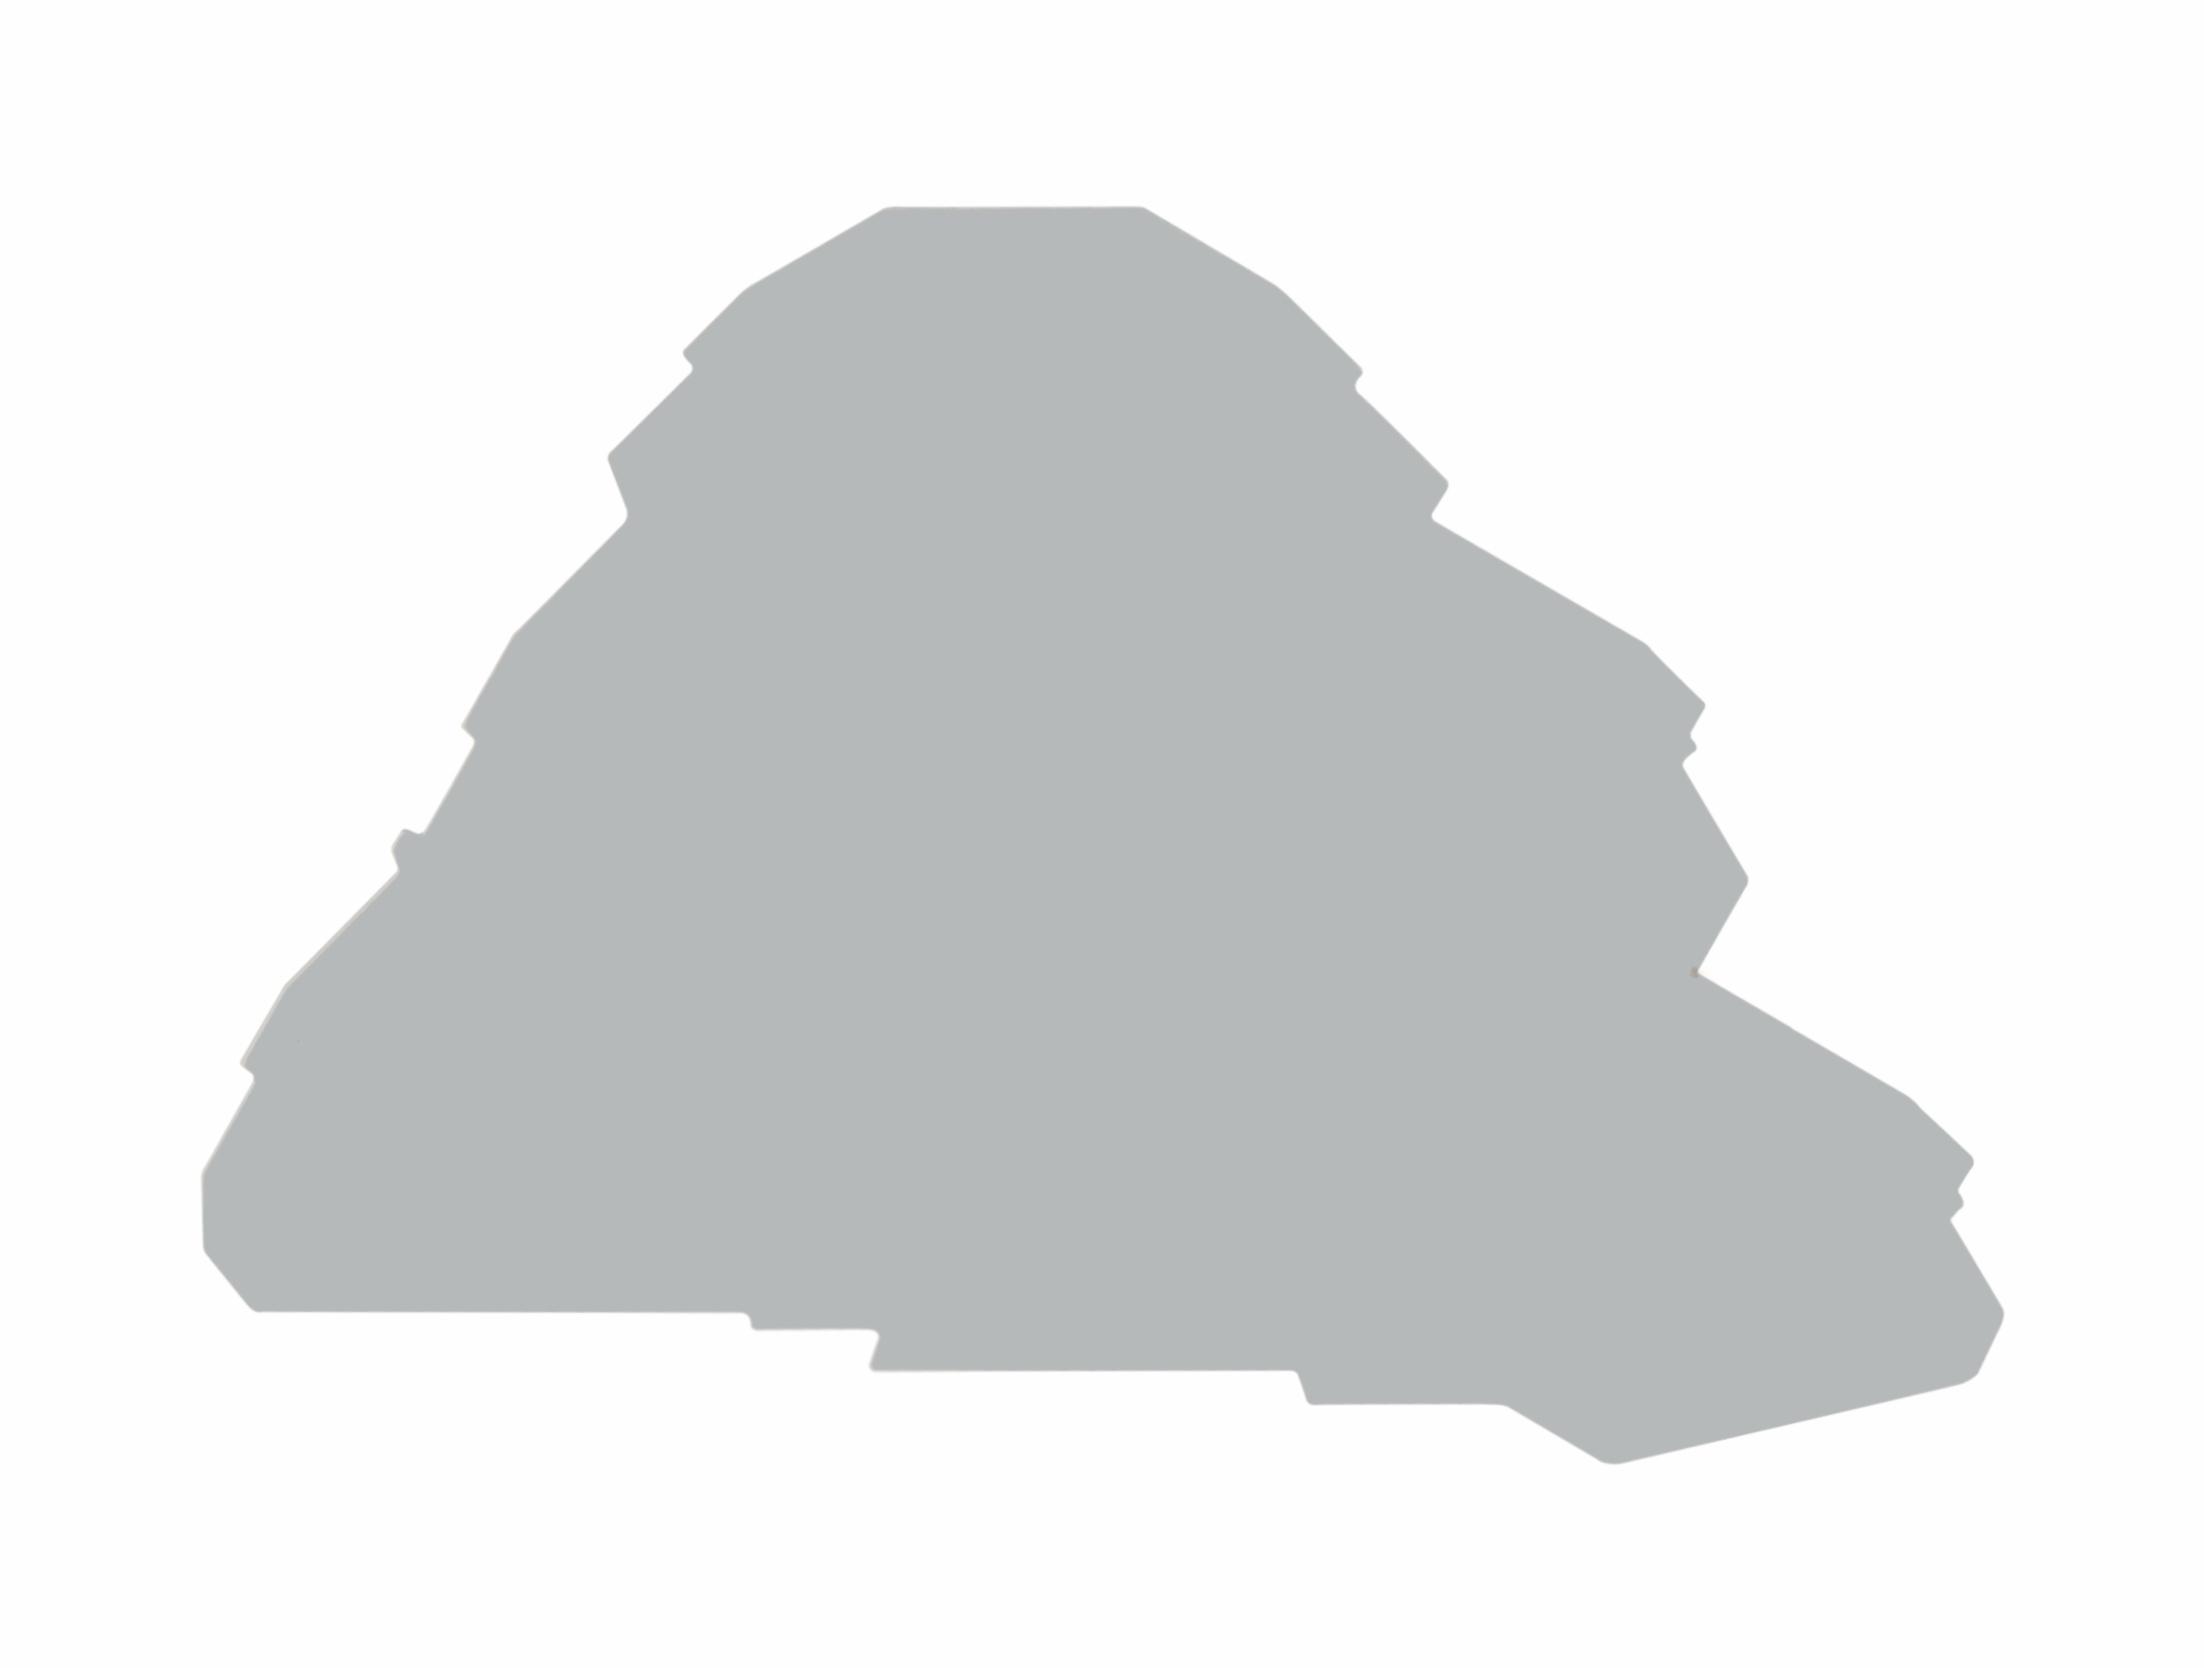 1 Stk Endplatte für Dreistockklemme (IK690001) IK690201--